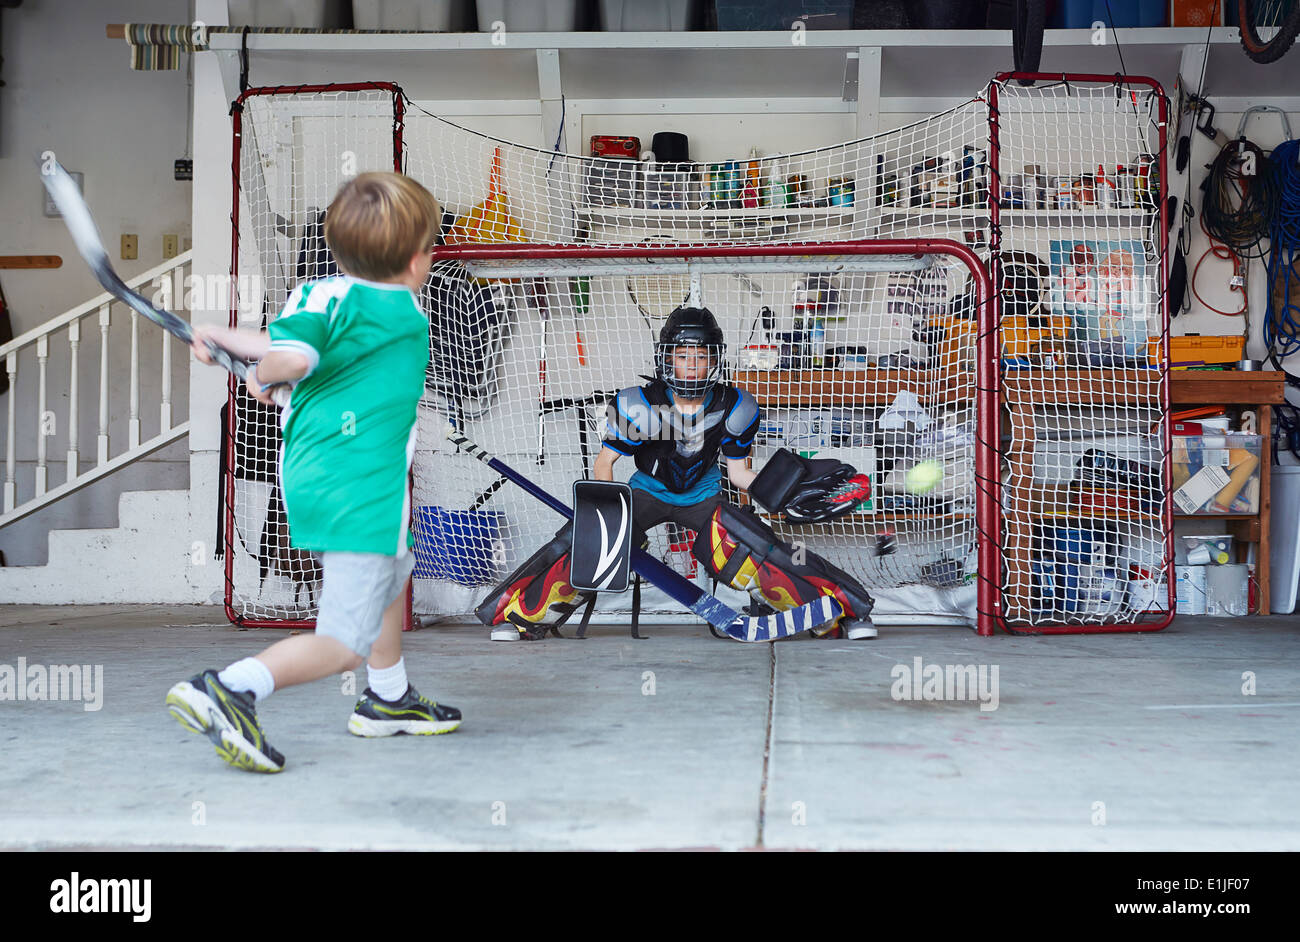 Boys playing hockey in garage - Stock Image